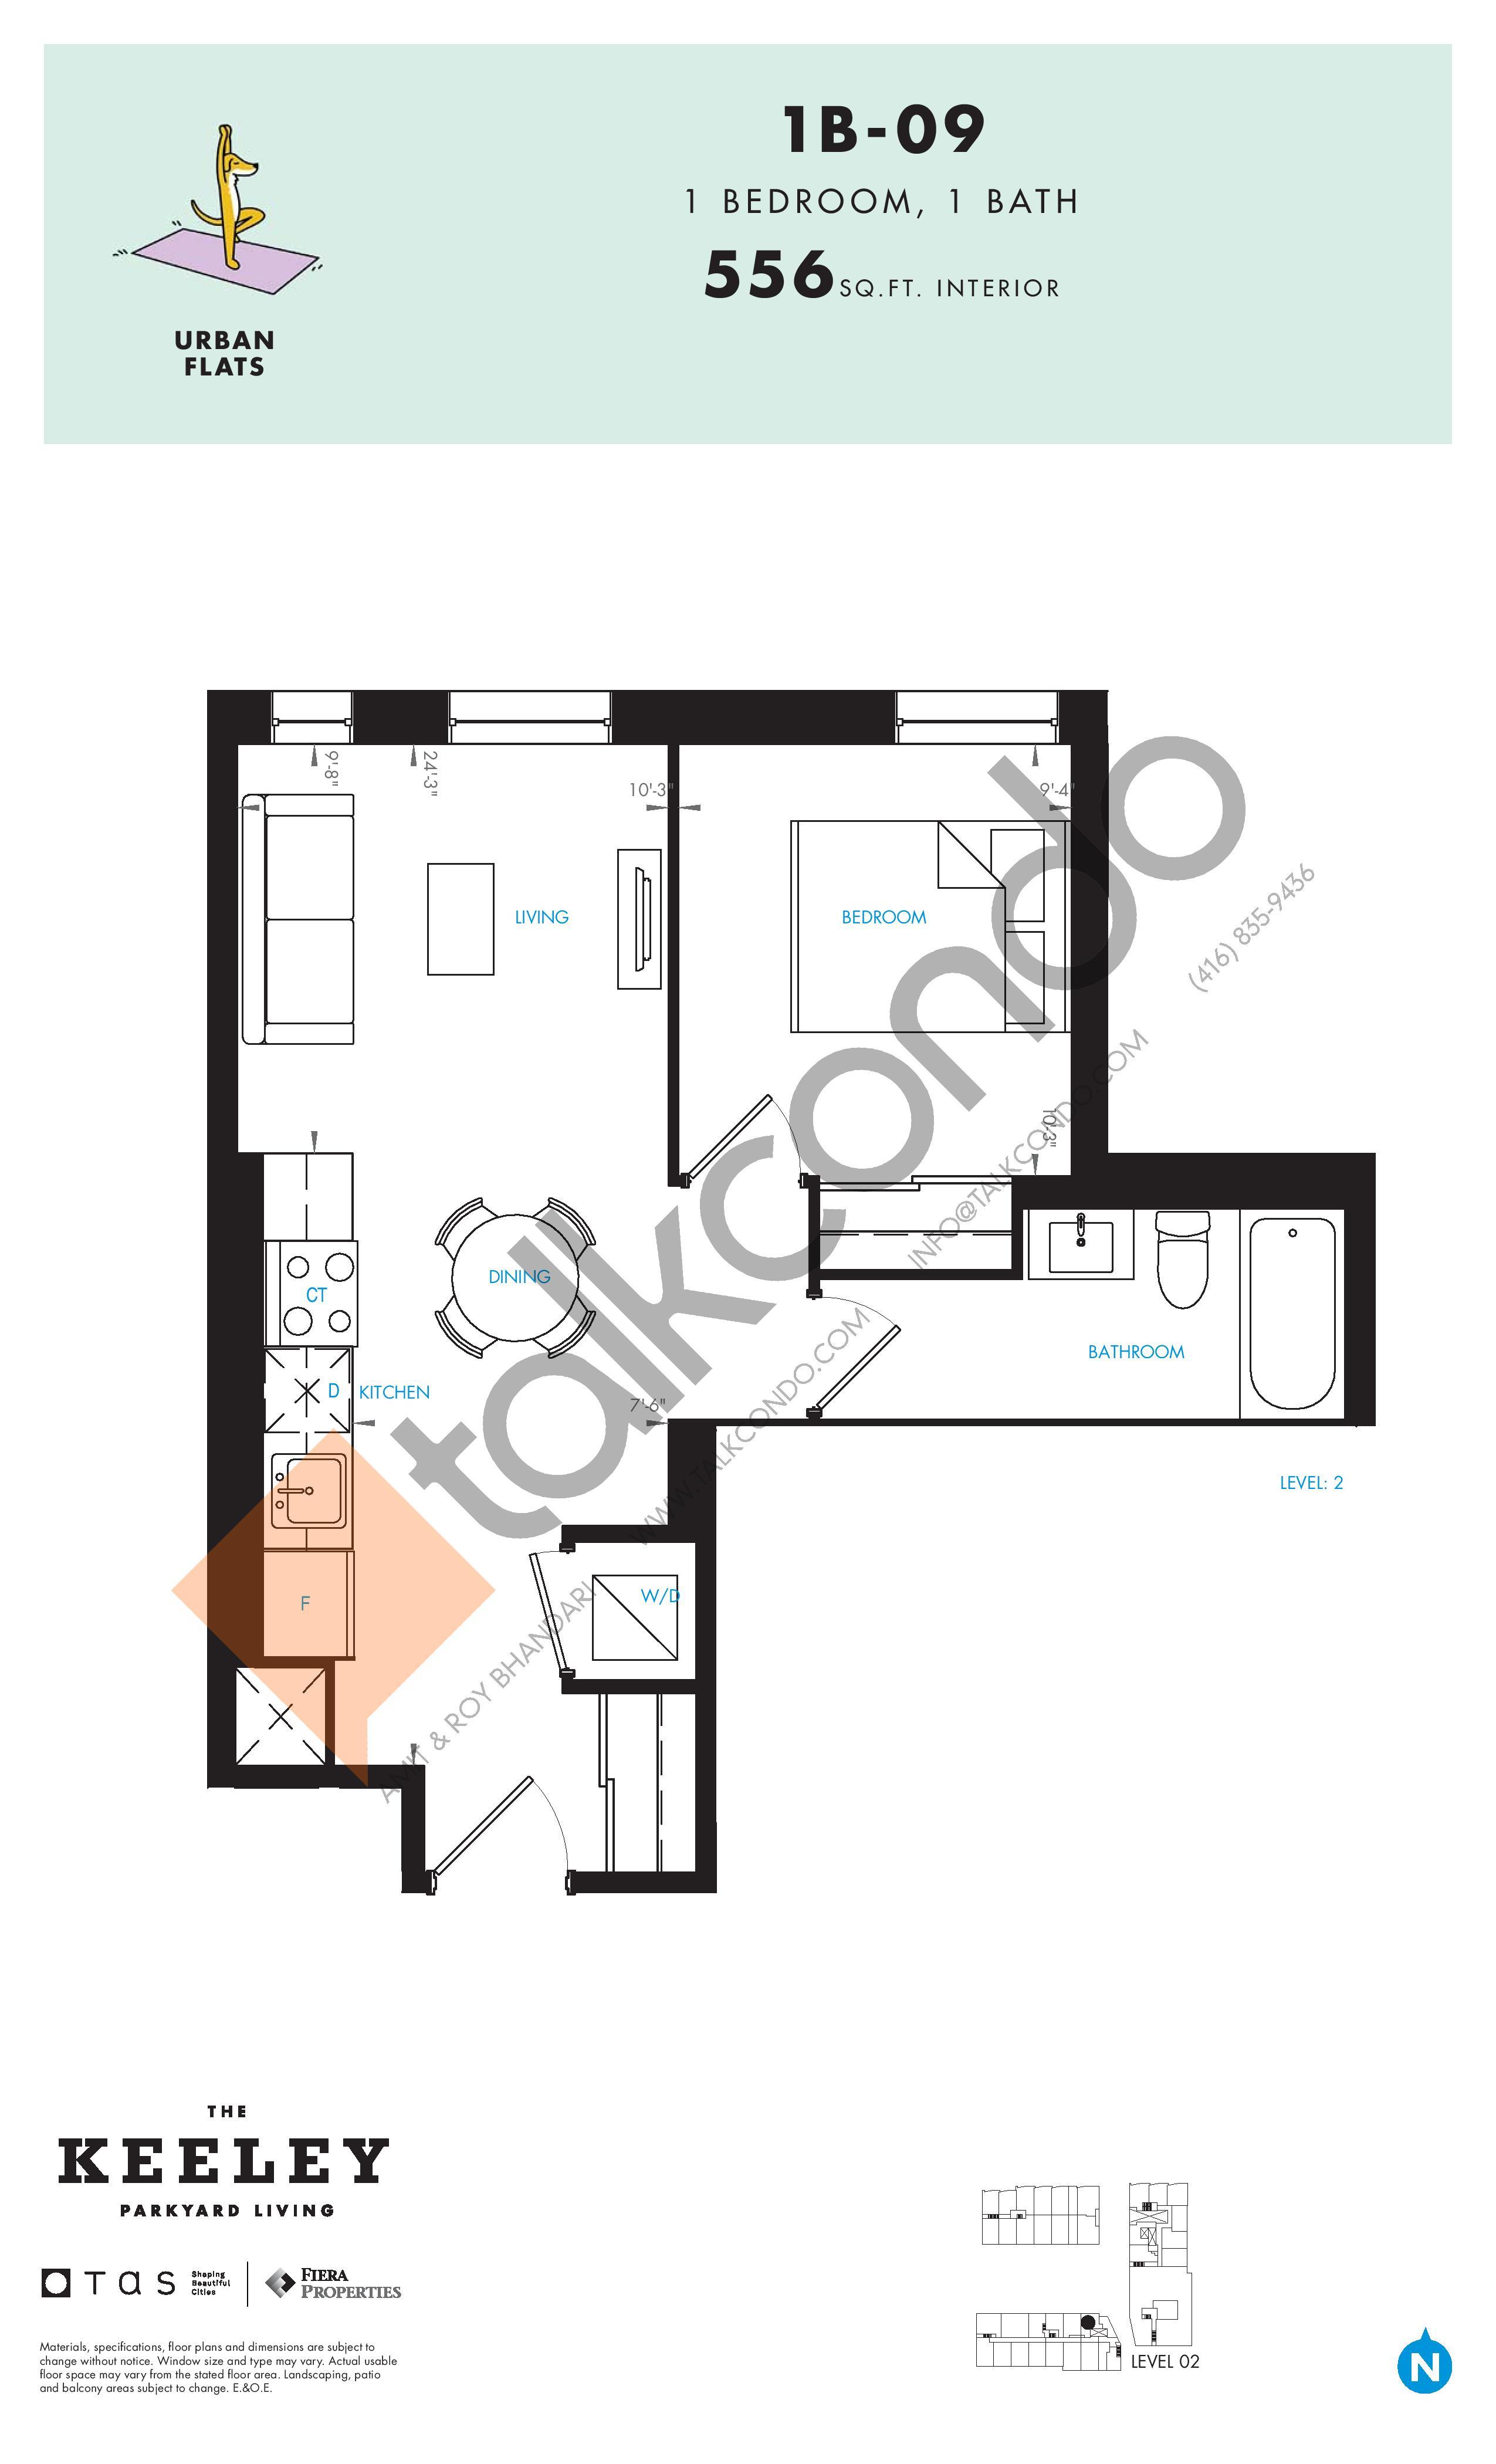 1B-09 Floor Plan at The Keeley Condos - 556 sq.ft